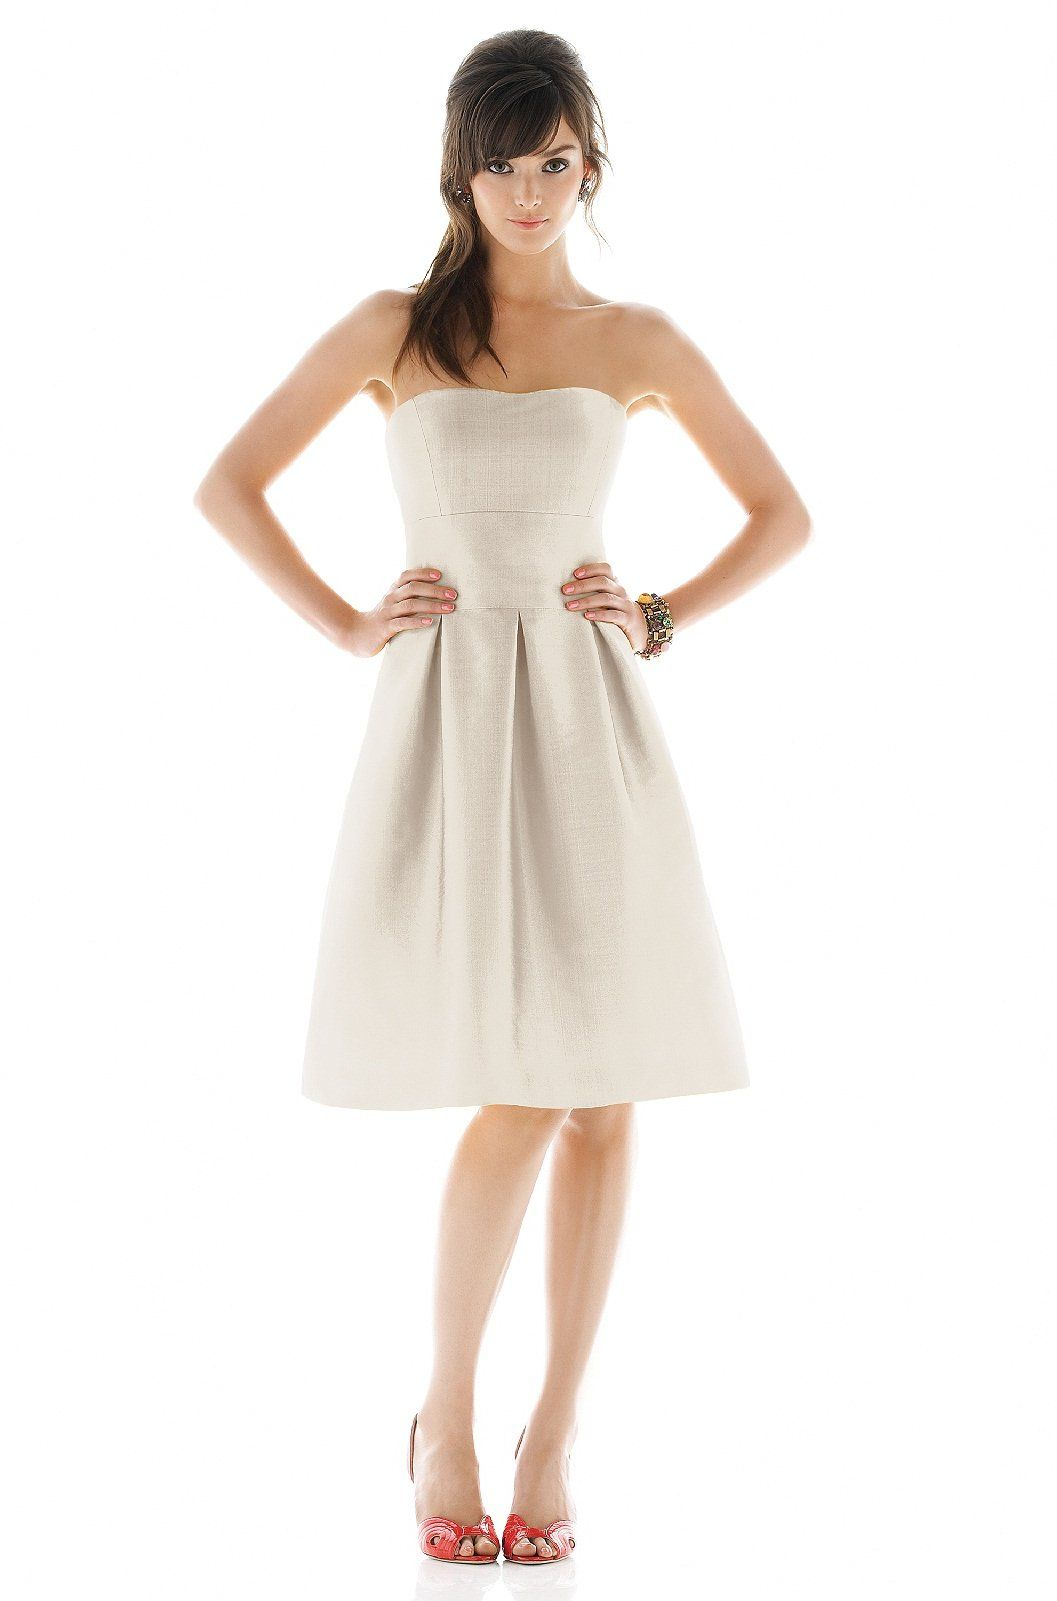 Alfred sung d446 bridesmaid dress weddington way jamie and jbar alfred sung d446 bridesmaid dress weddington way ombrellifo Choice Image